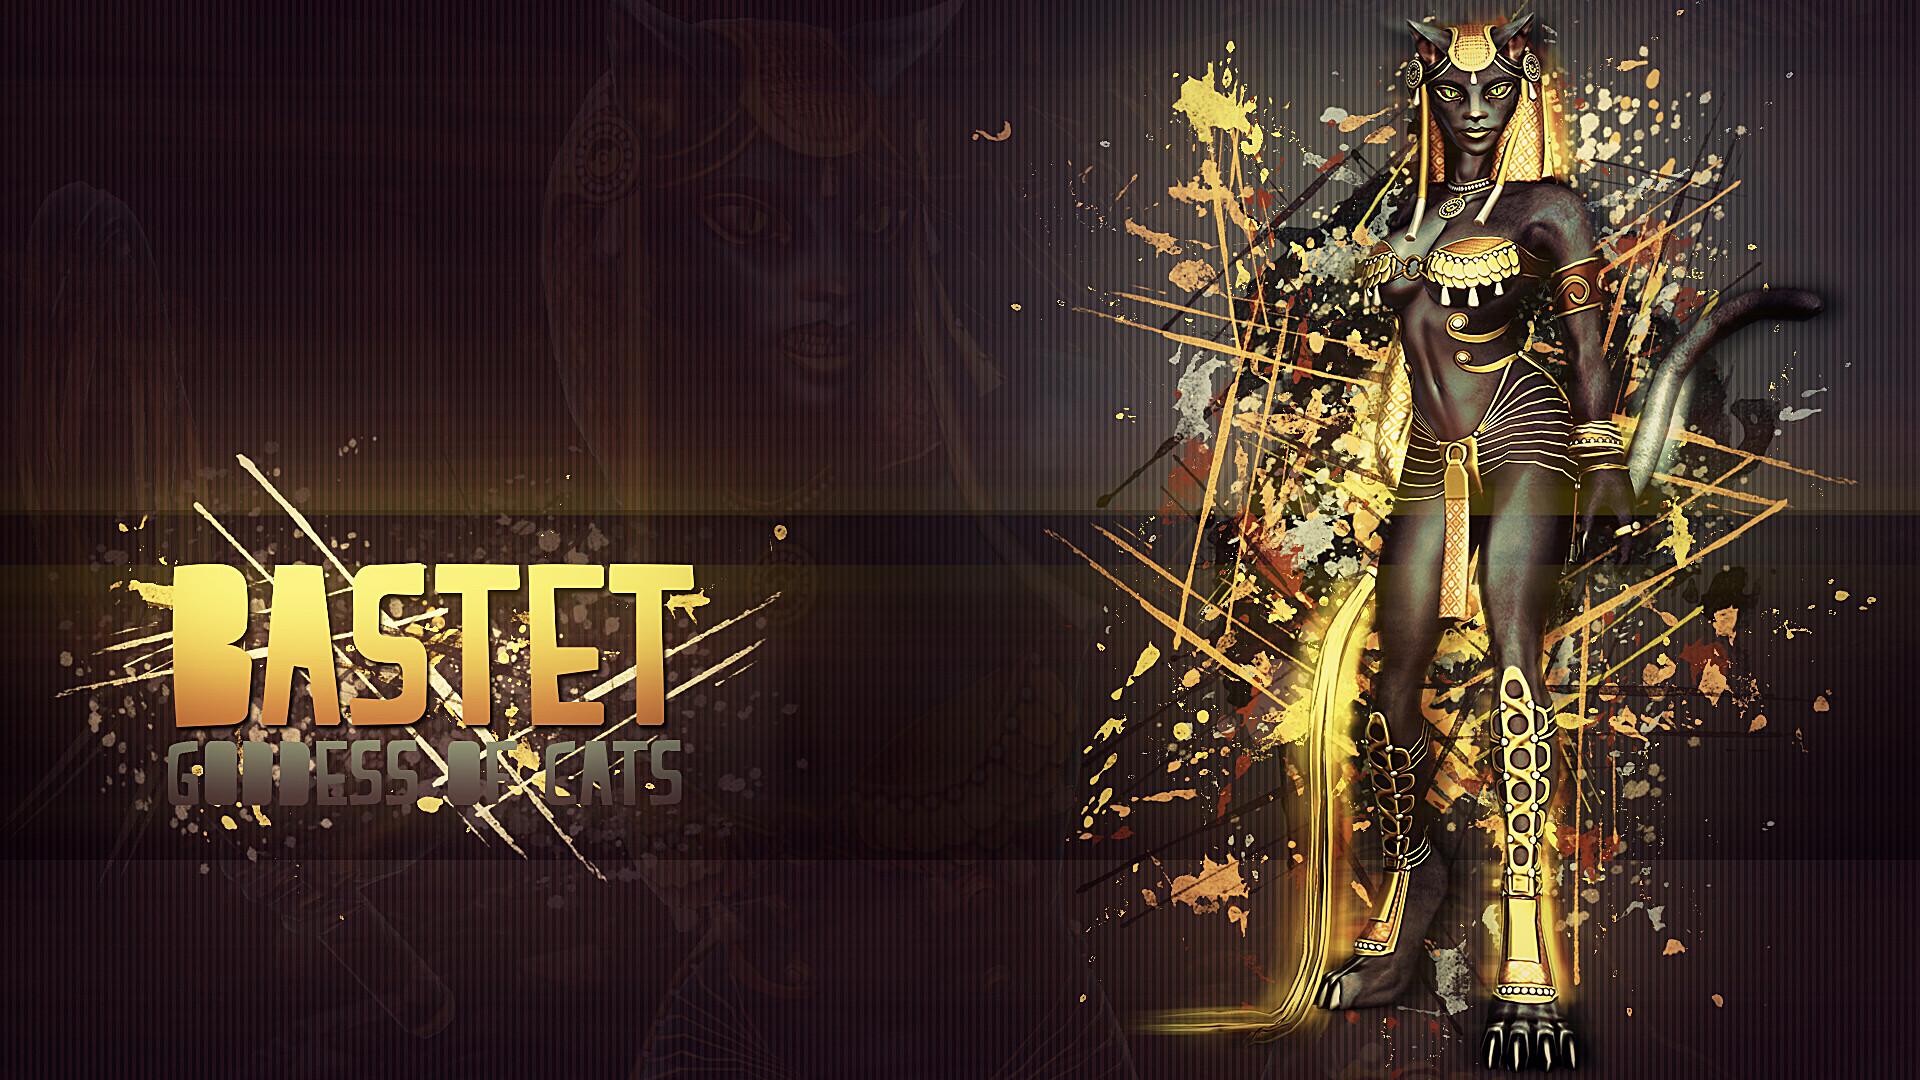 Bastet, Goddess of Cats – Wallpaper HD by Getsukeii on DeviantArt